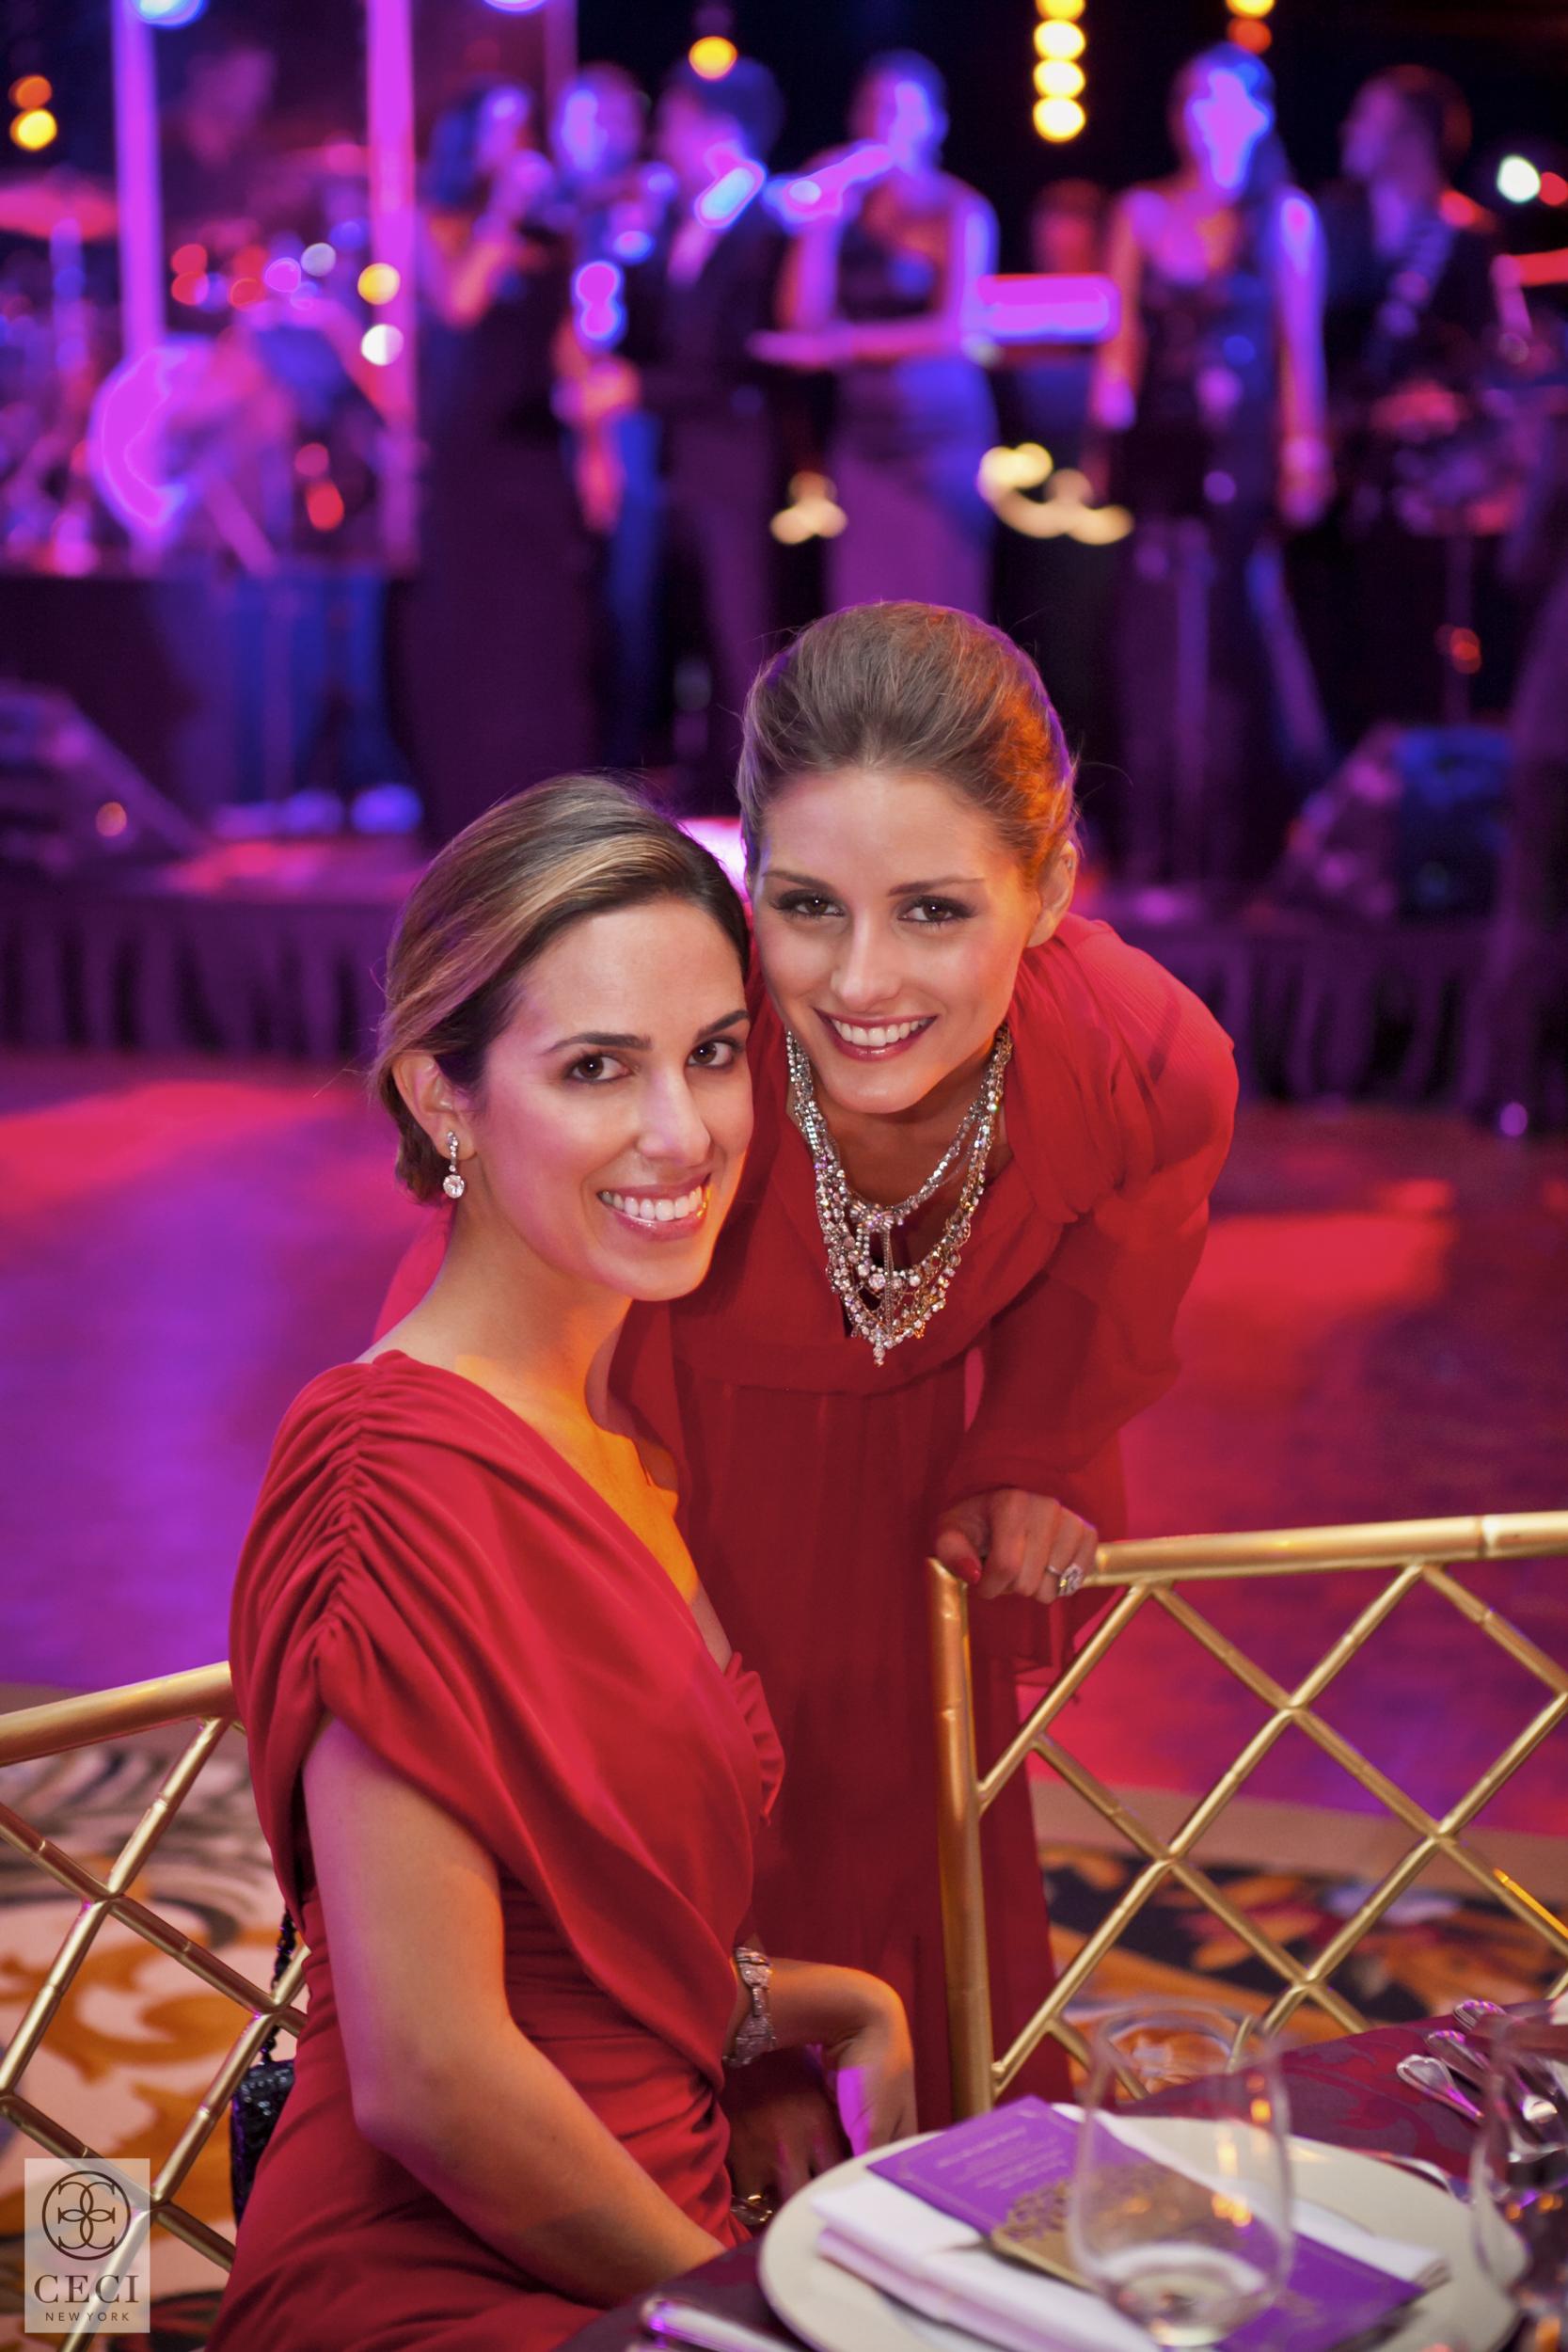 ceci_new_york_lucas_somoza_purple_regal_wediding_birthday_commitment_ceremony_gold-23.jpg